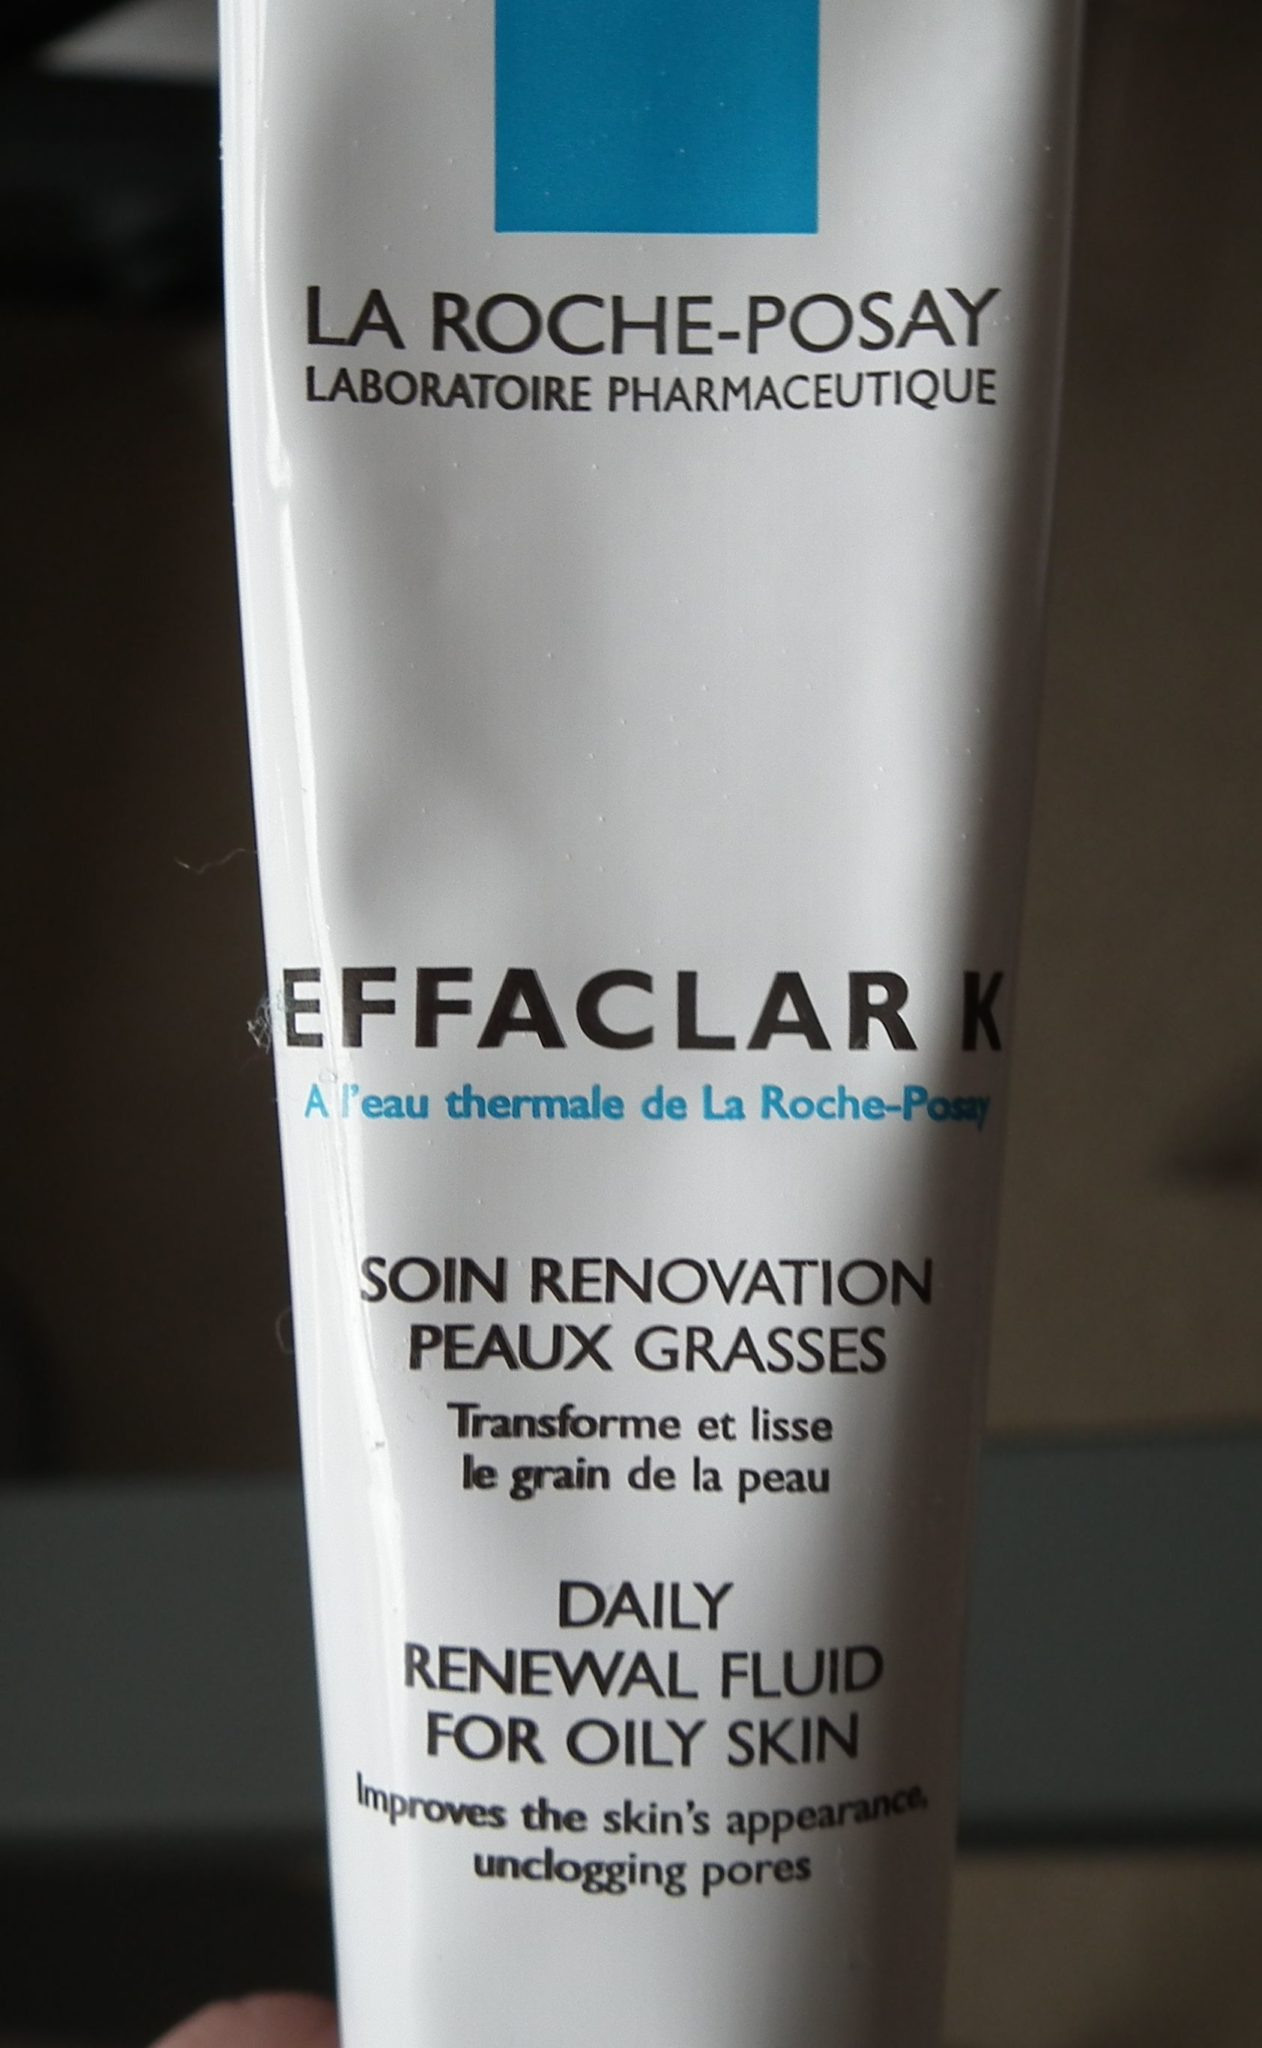 luxury fl oz oil com mats roche free moisturizer dp beauty posay amazon mat for oily face la effaclar skin